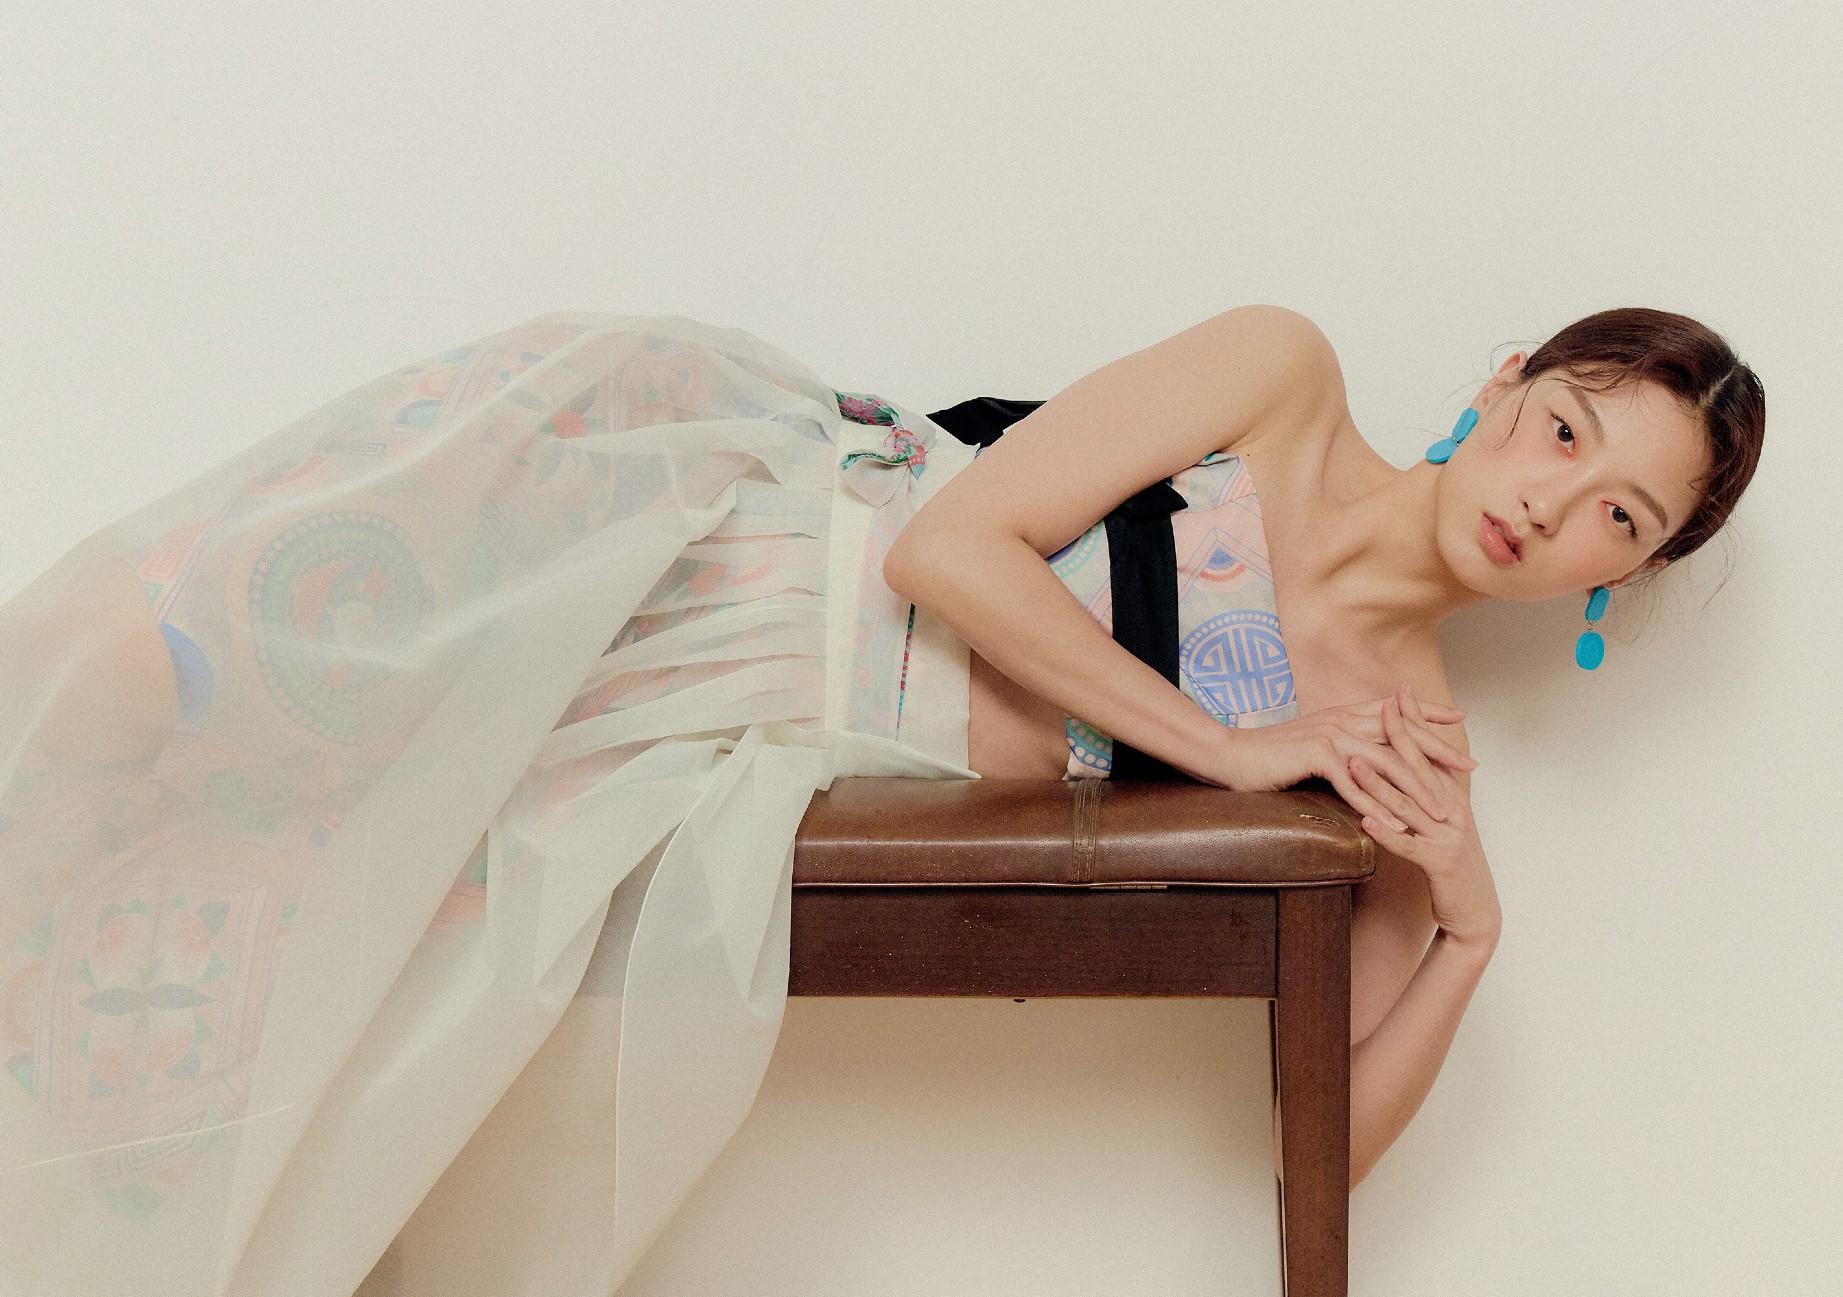 Korean sustainable fashion brand Danha 5